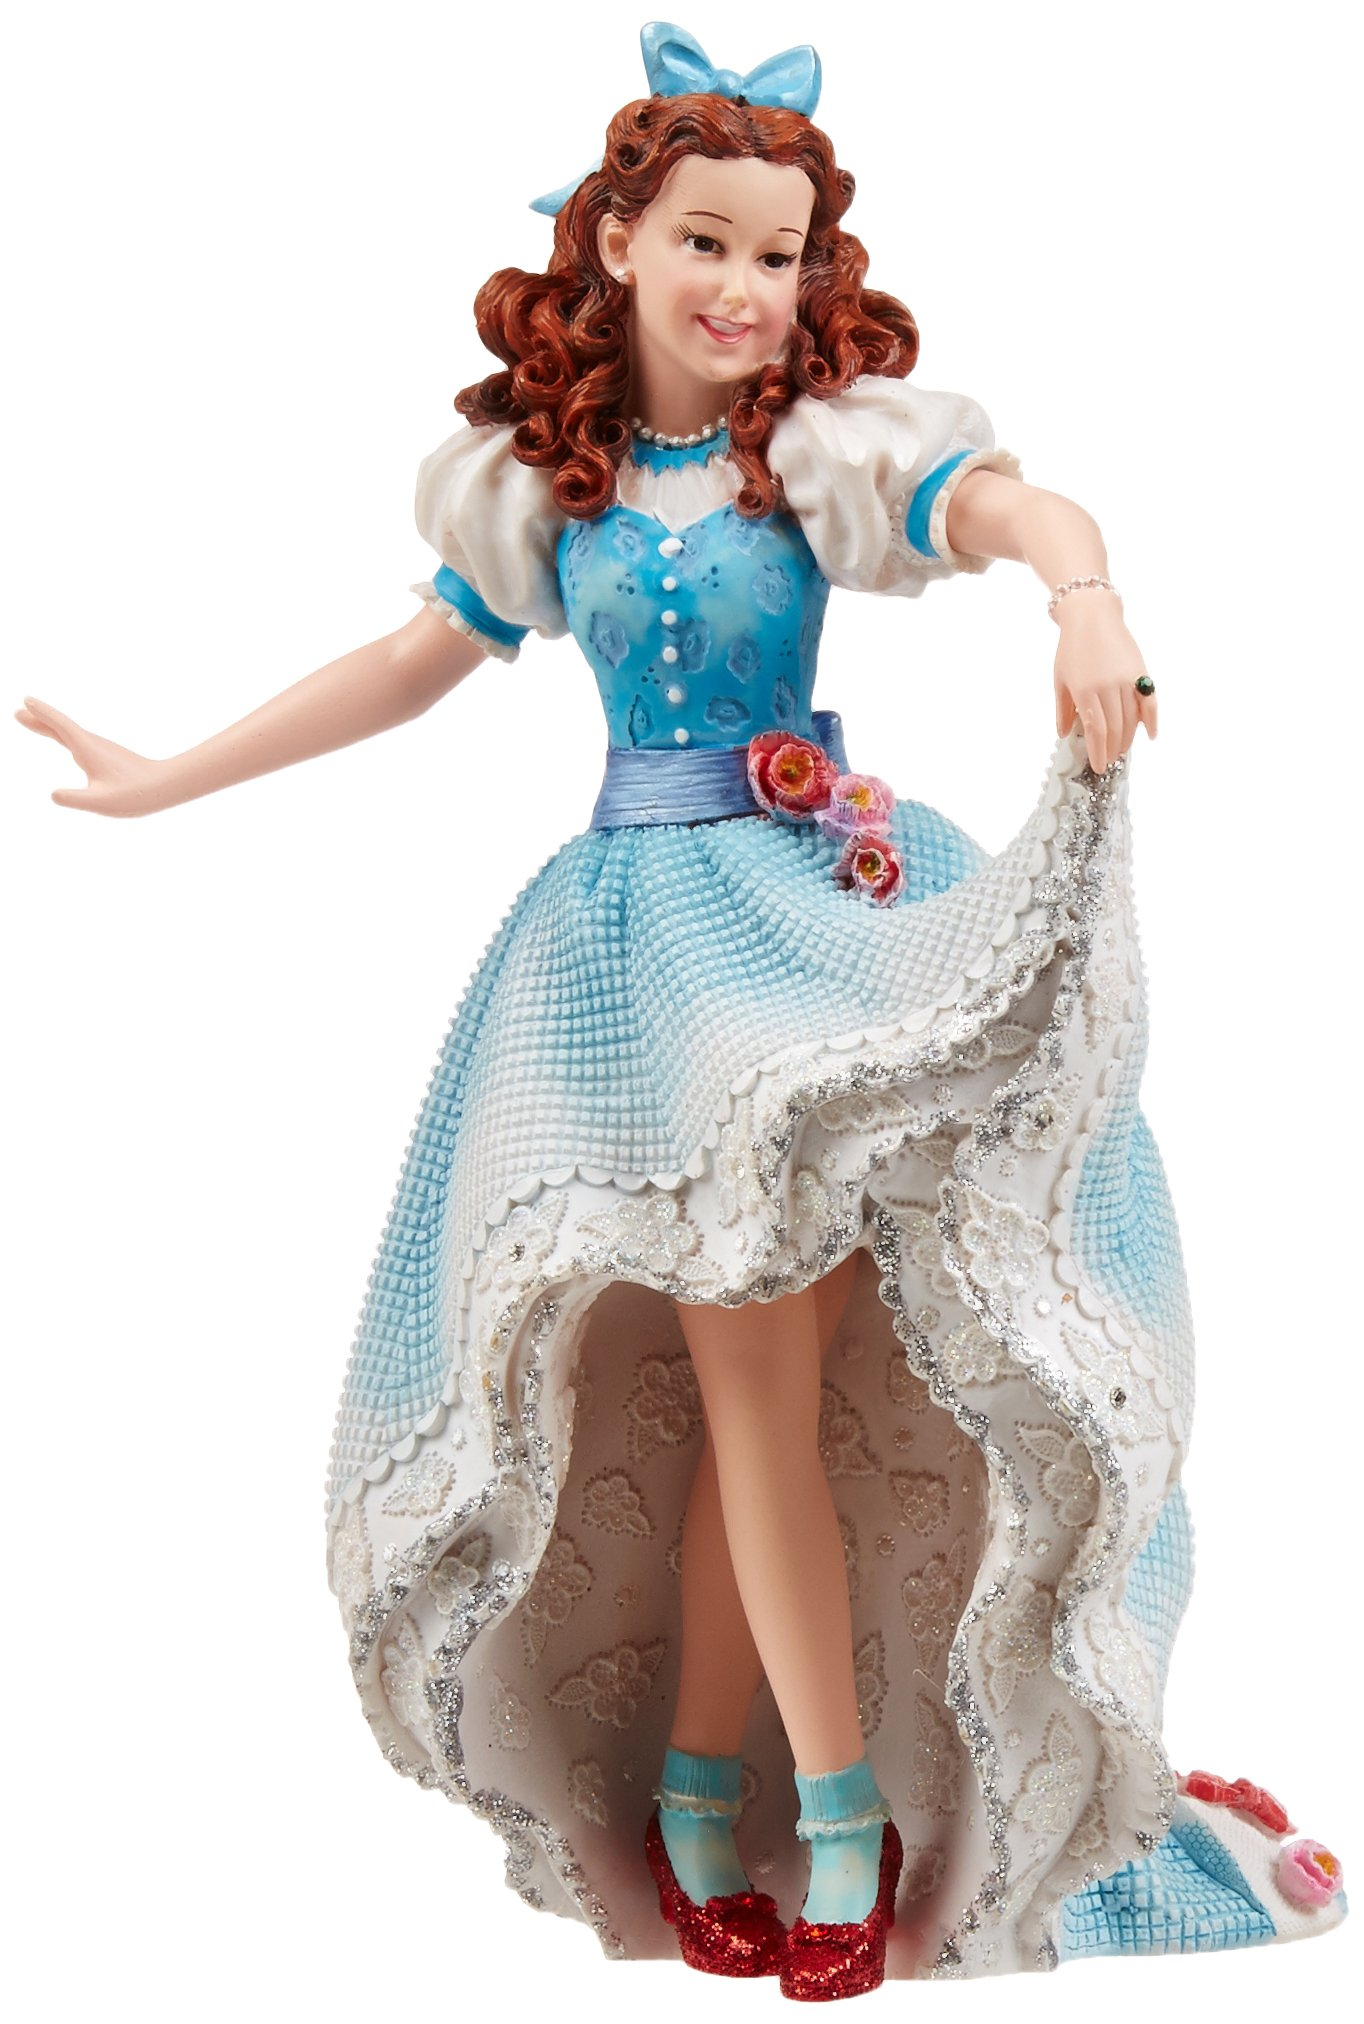 Enesco Warner Bros. Couture De Force Gift Dorothy Figurine, 7.75-Inch